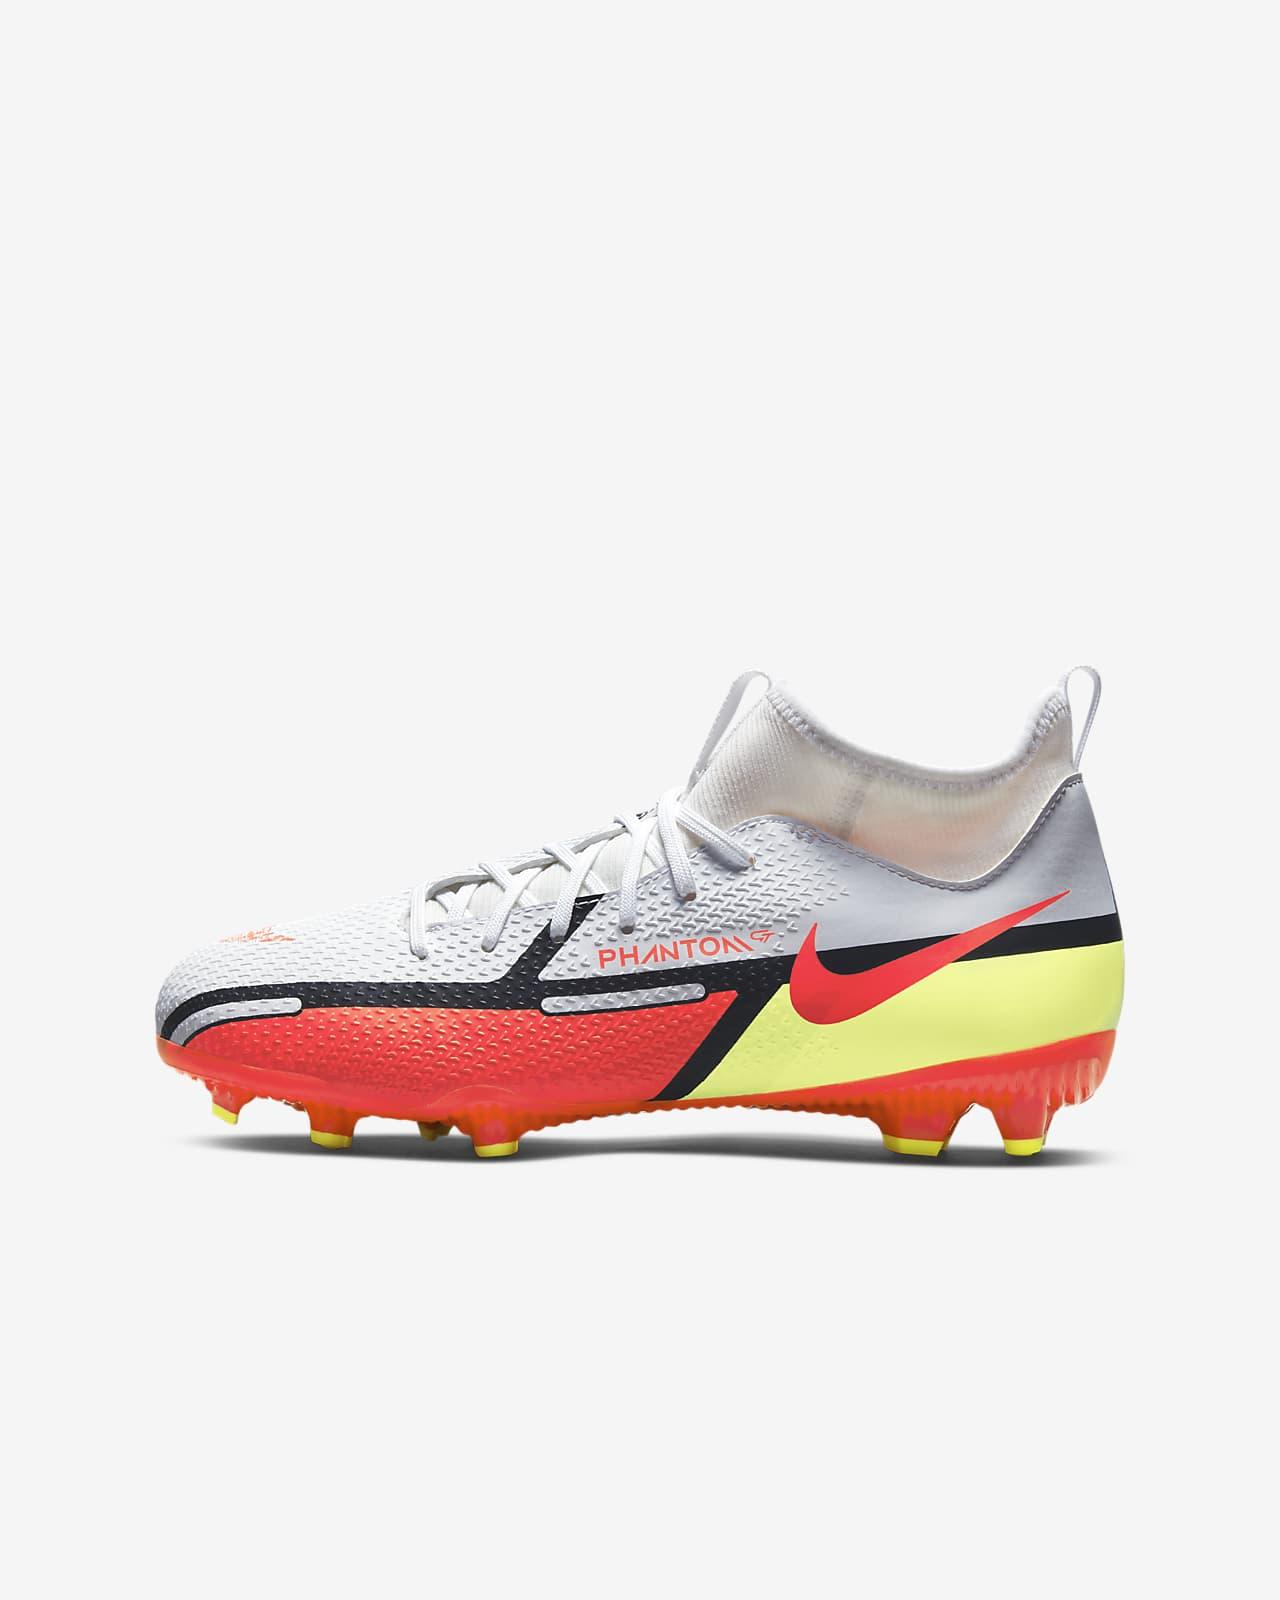 Nike Jr. Phantom GT2 Academy Dynamic Fit MG Little/Older Kids' Multi-Ground Football Boot